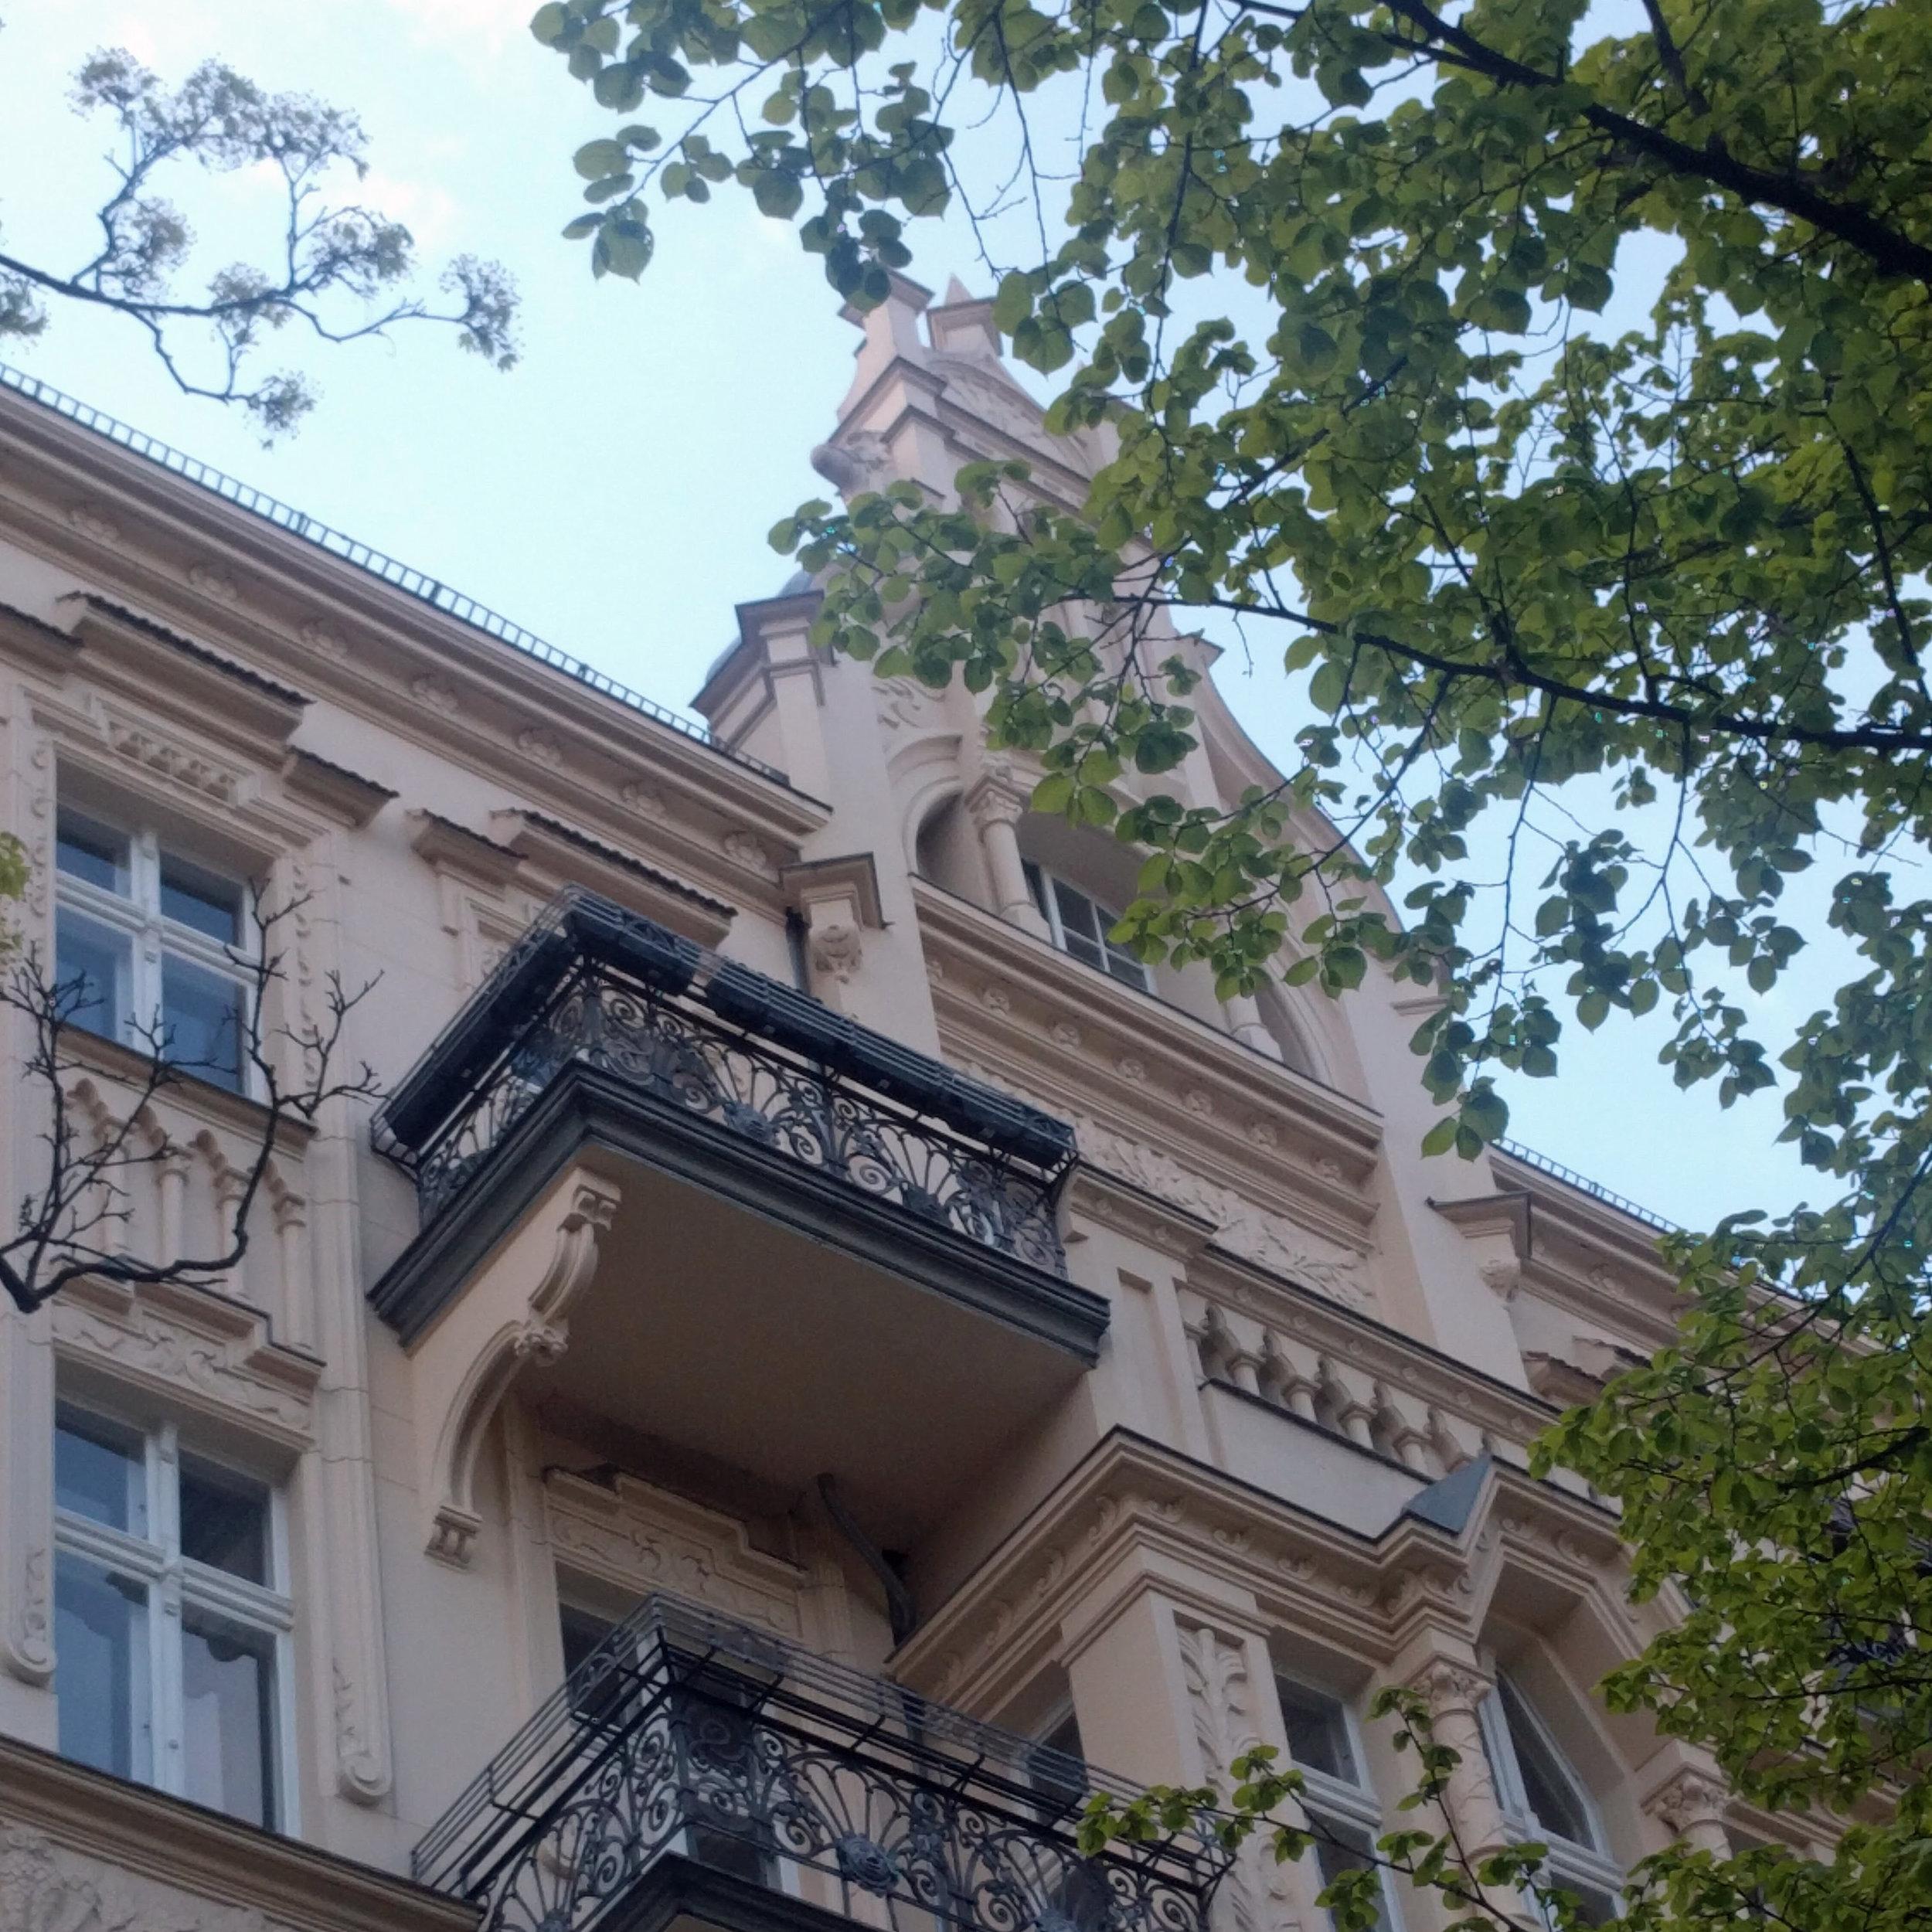 Spring in Berlin Germany. Altbau apartment building. European architecture design.